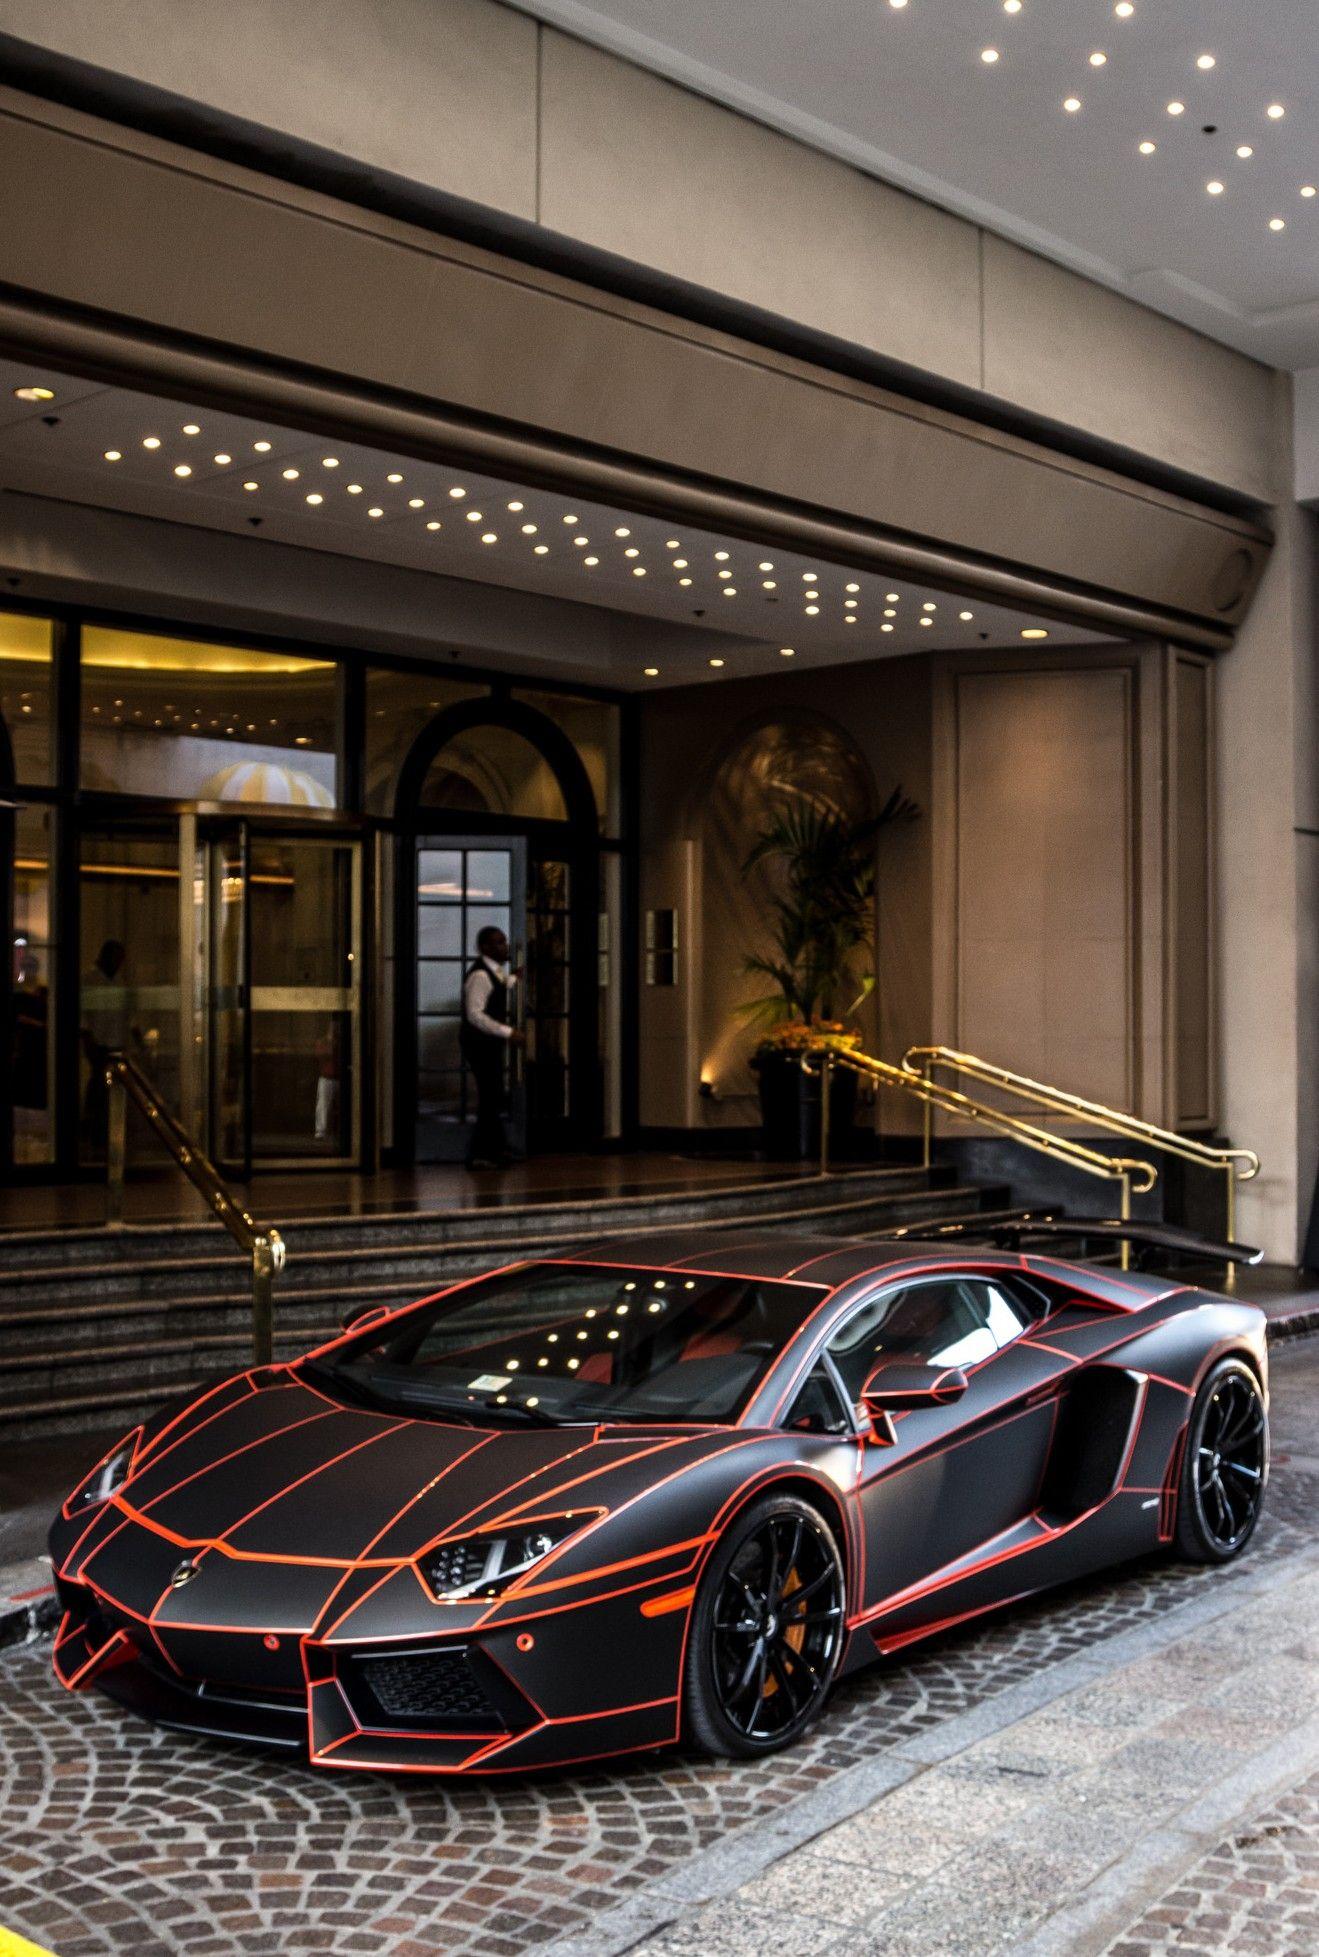 Top 10 Portable Air Compressor For Car Reviews Best Luxury Cars Lamborghini Cars Dream Cars